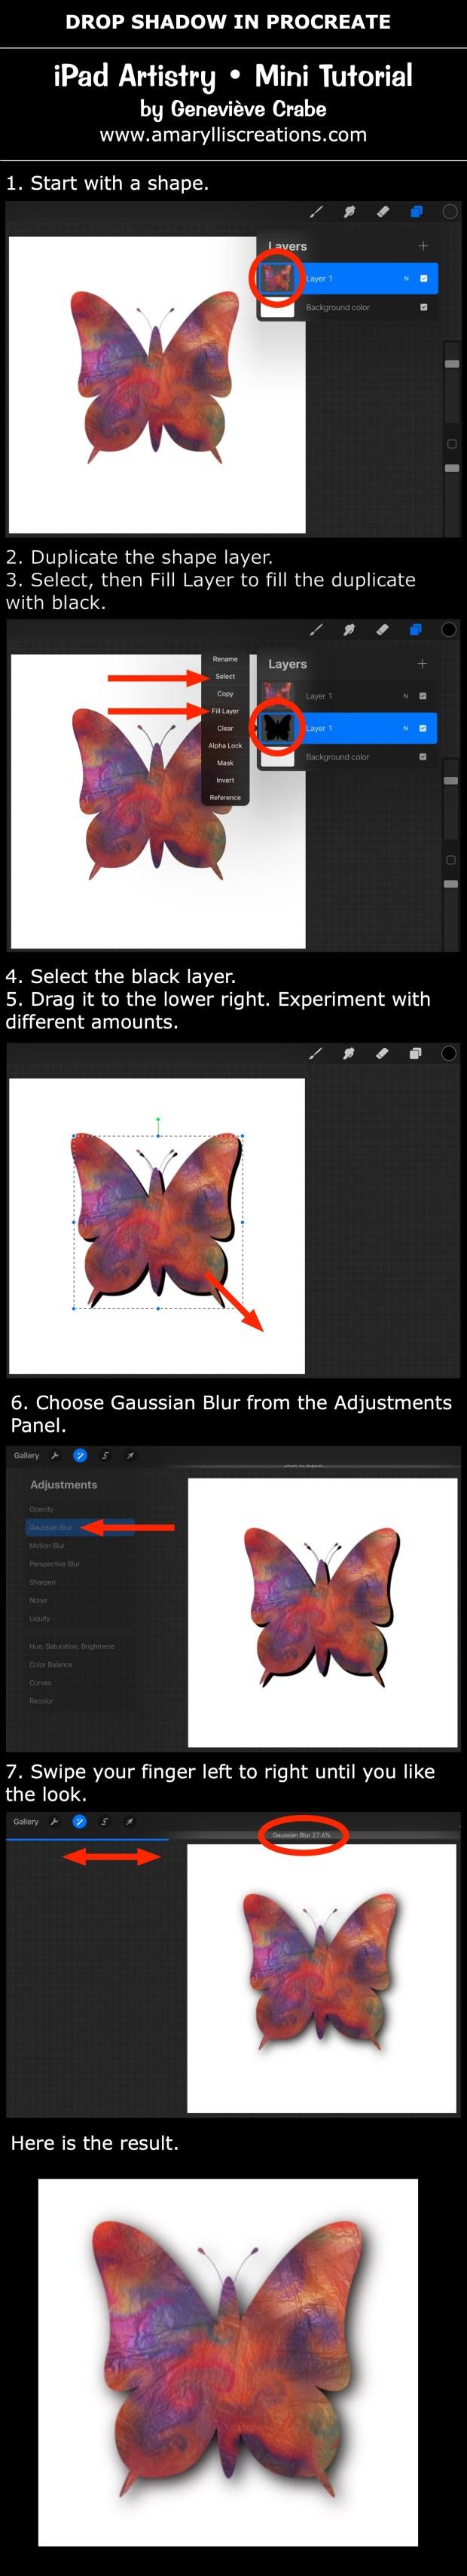 Mini tutorial: Drop Shadow in Procreate on iPad